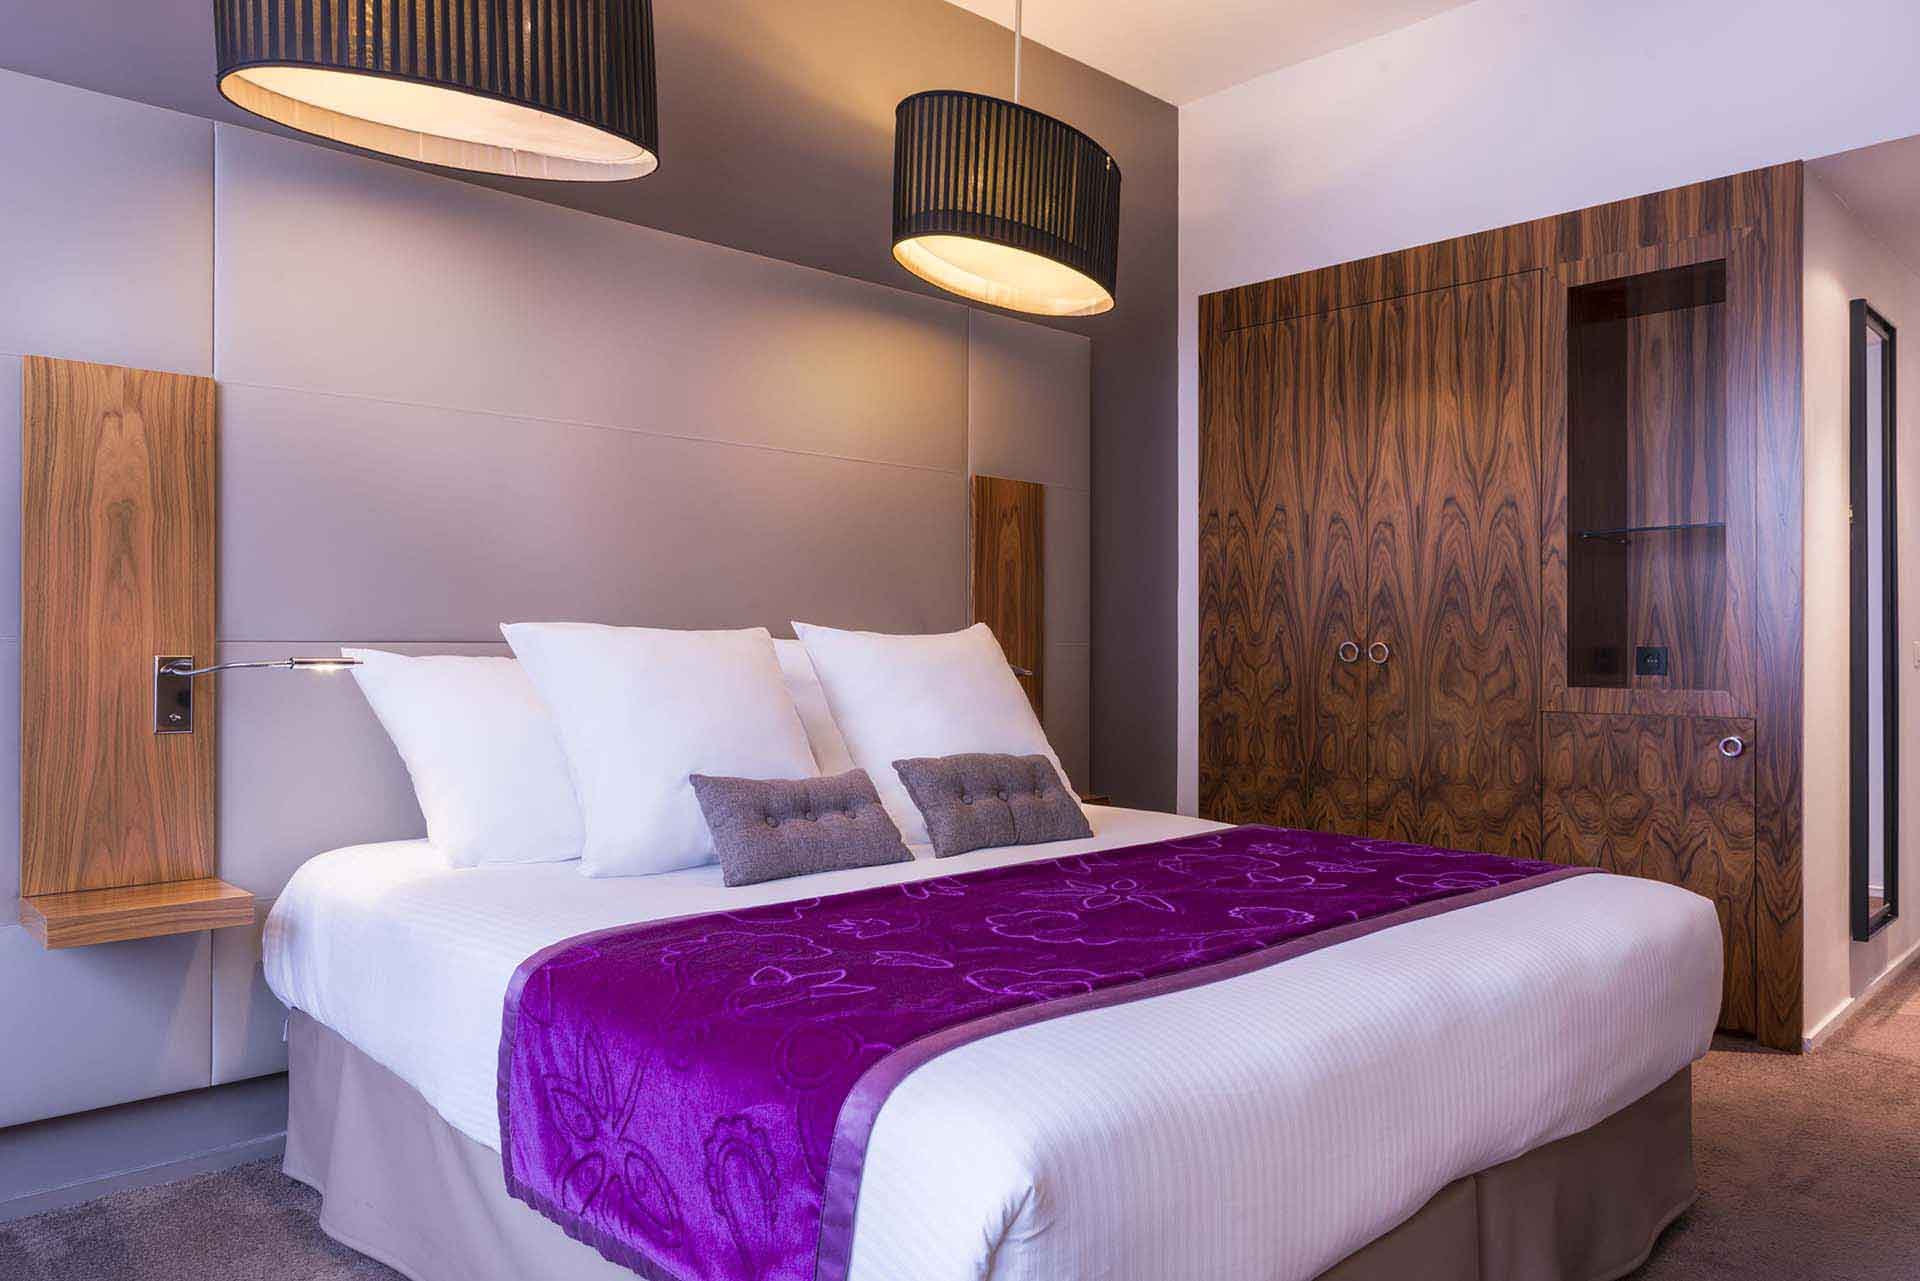 photo gallery hotel etoile saint honor. Black Bedroom Furniture Sets. Home Design Ideas